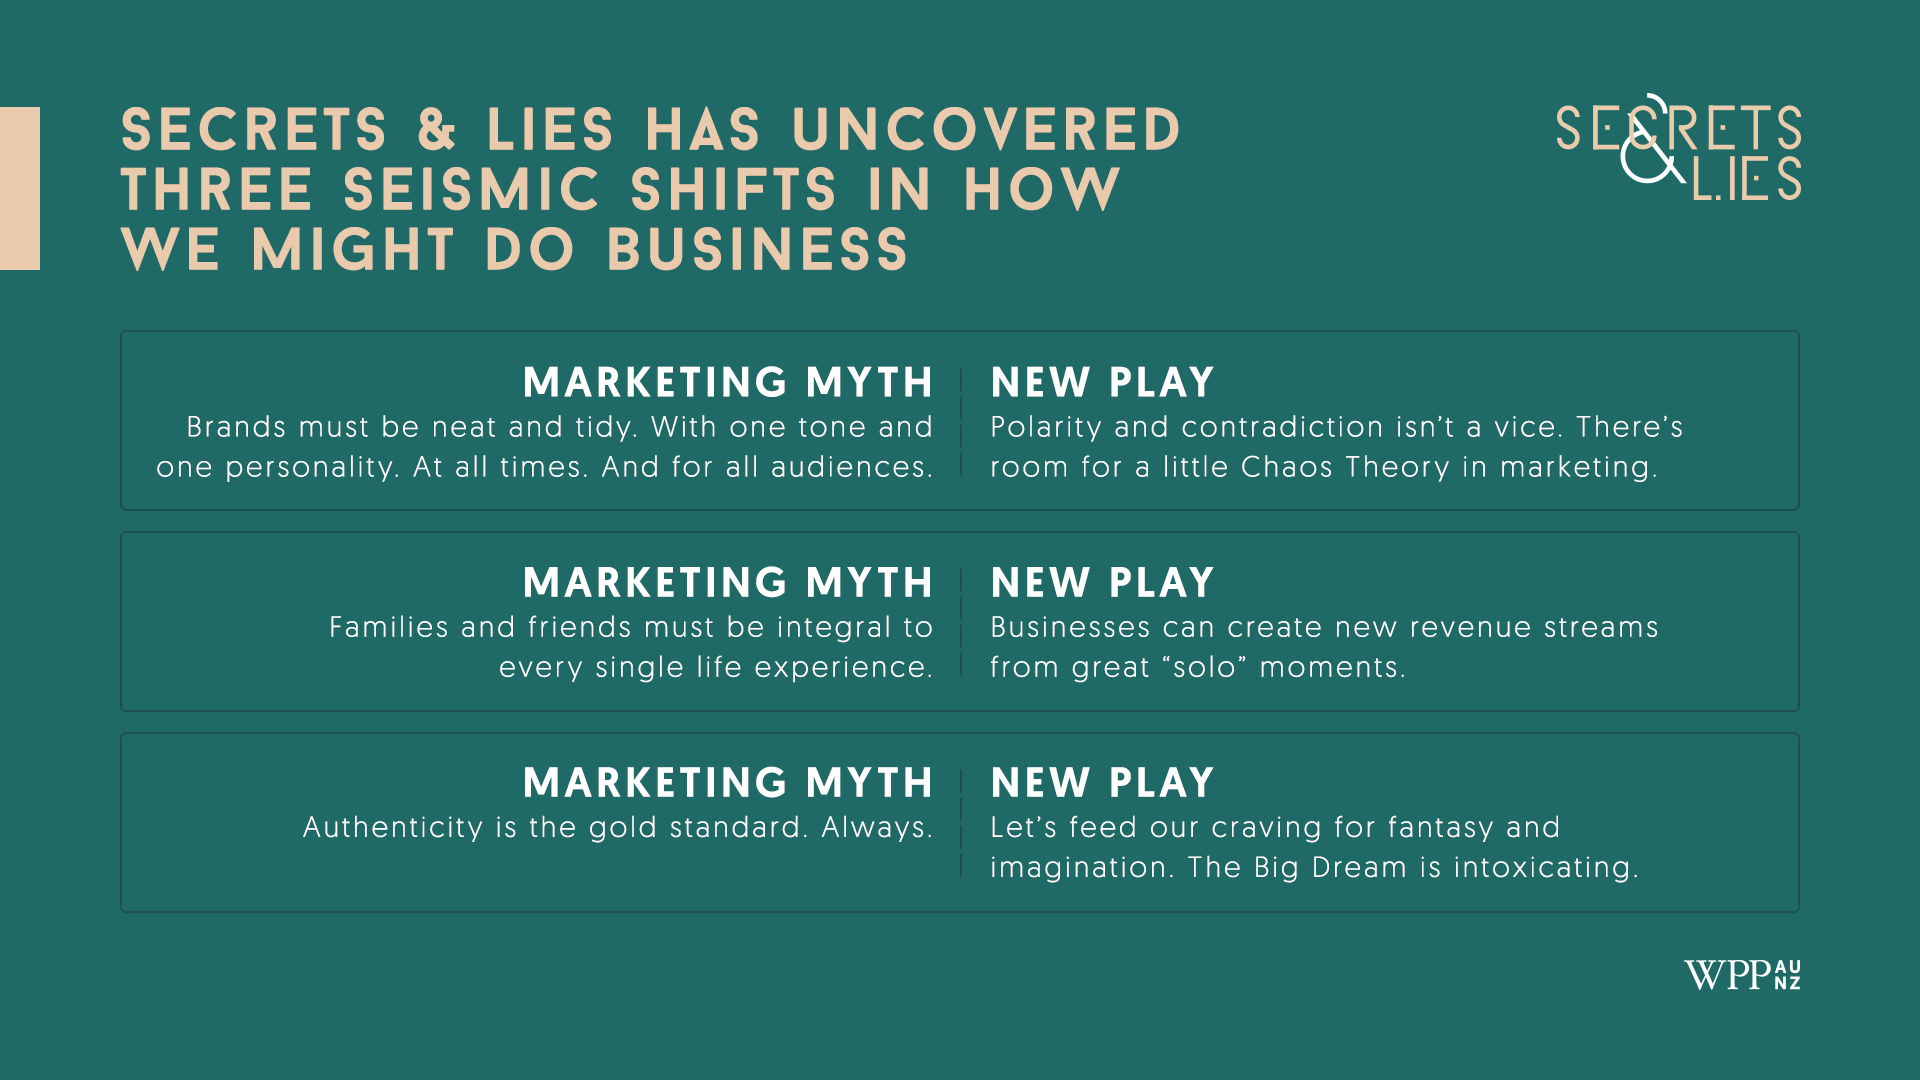 Marketing Myths & New Plays